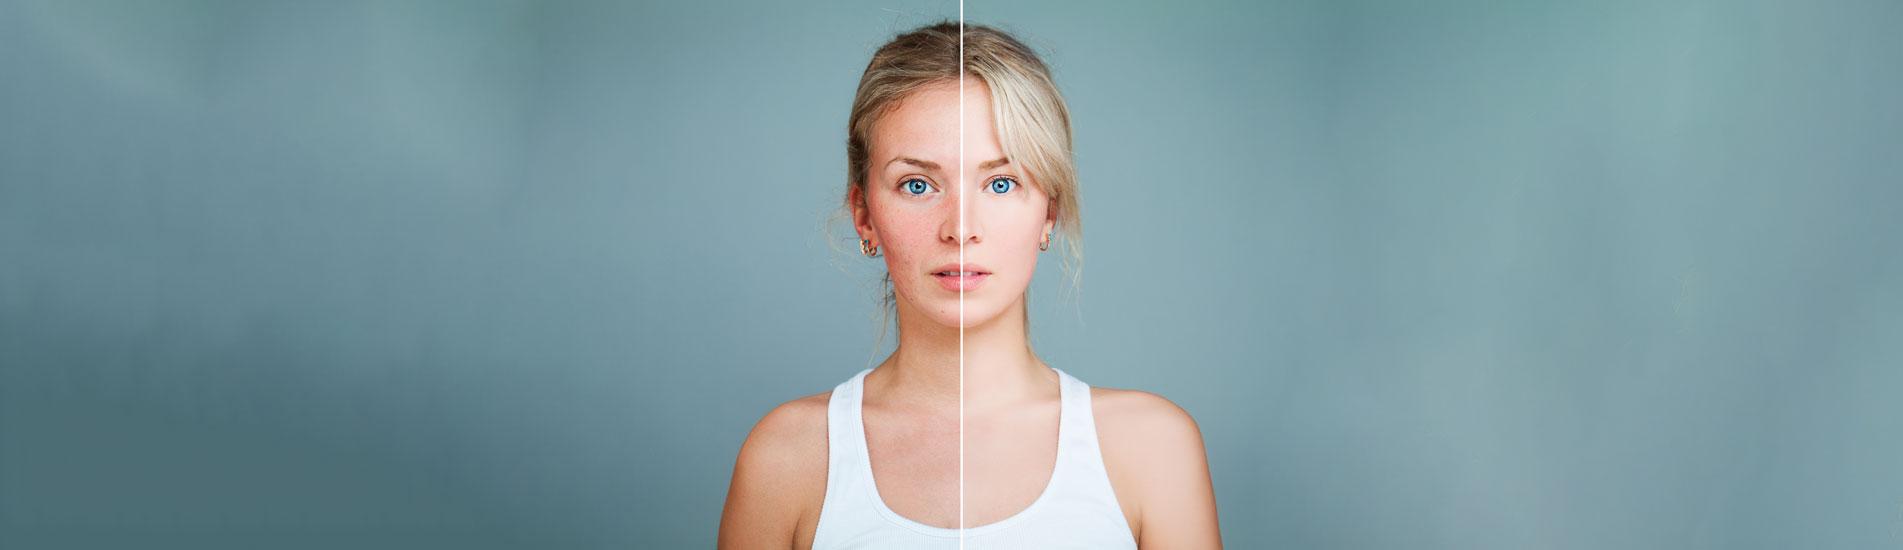 Hautarztpraxis am Roseneck - Akne - Rosacea